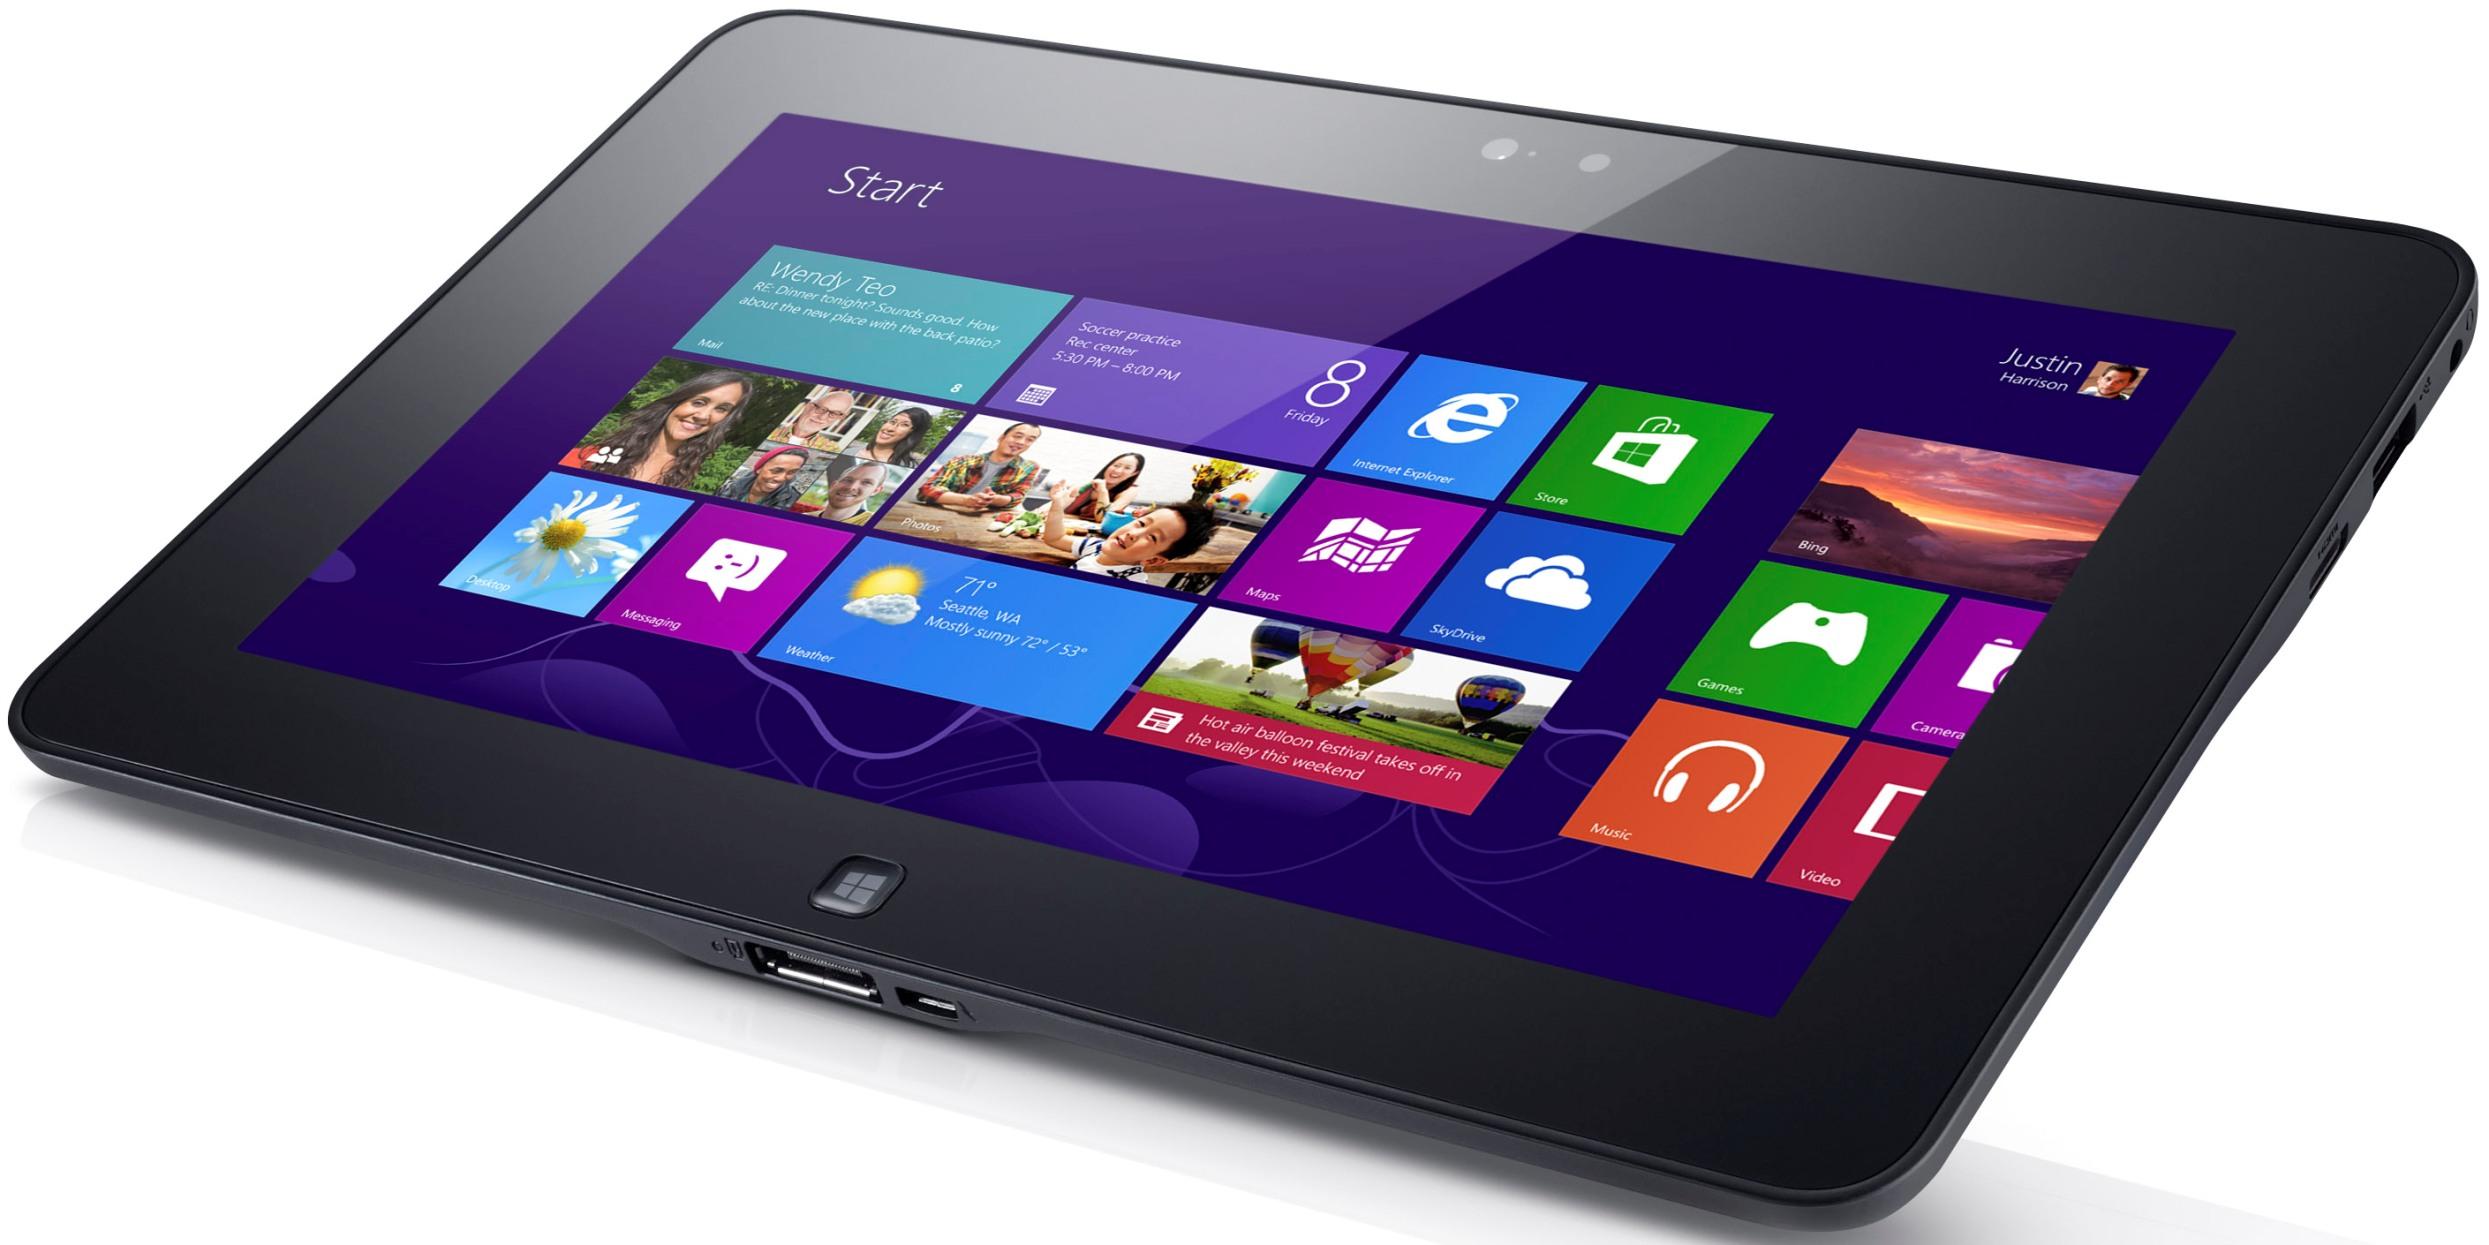 windows 8 tablet wallpaper Hd windows 8 tablet wallpaper 2489x1245